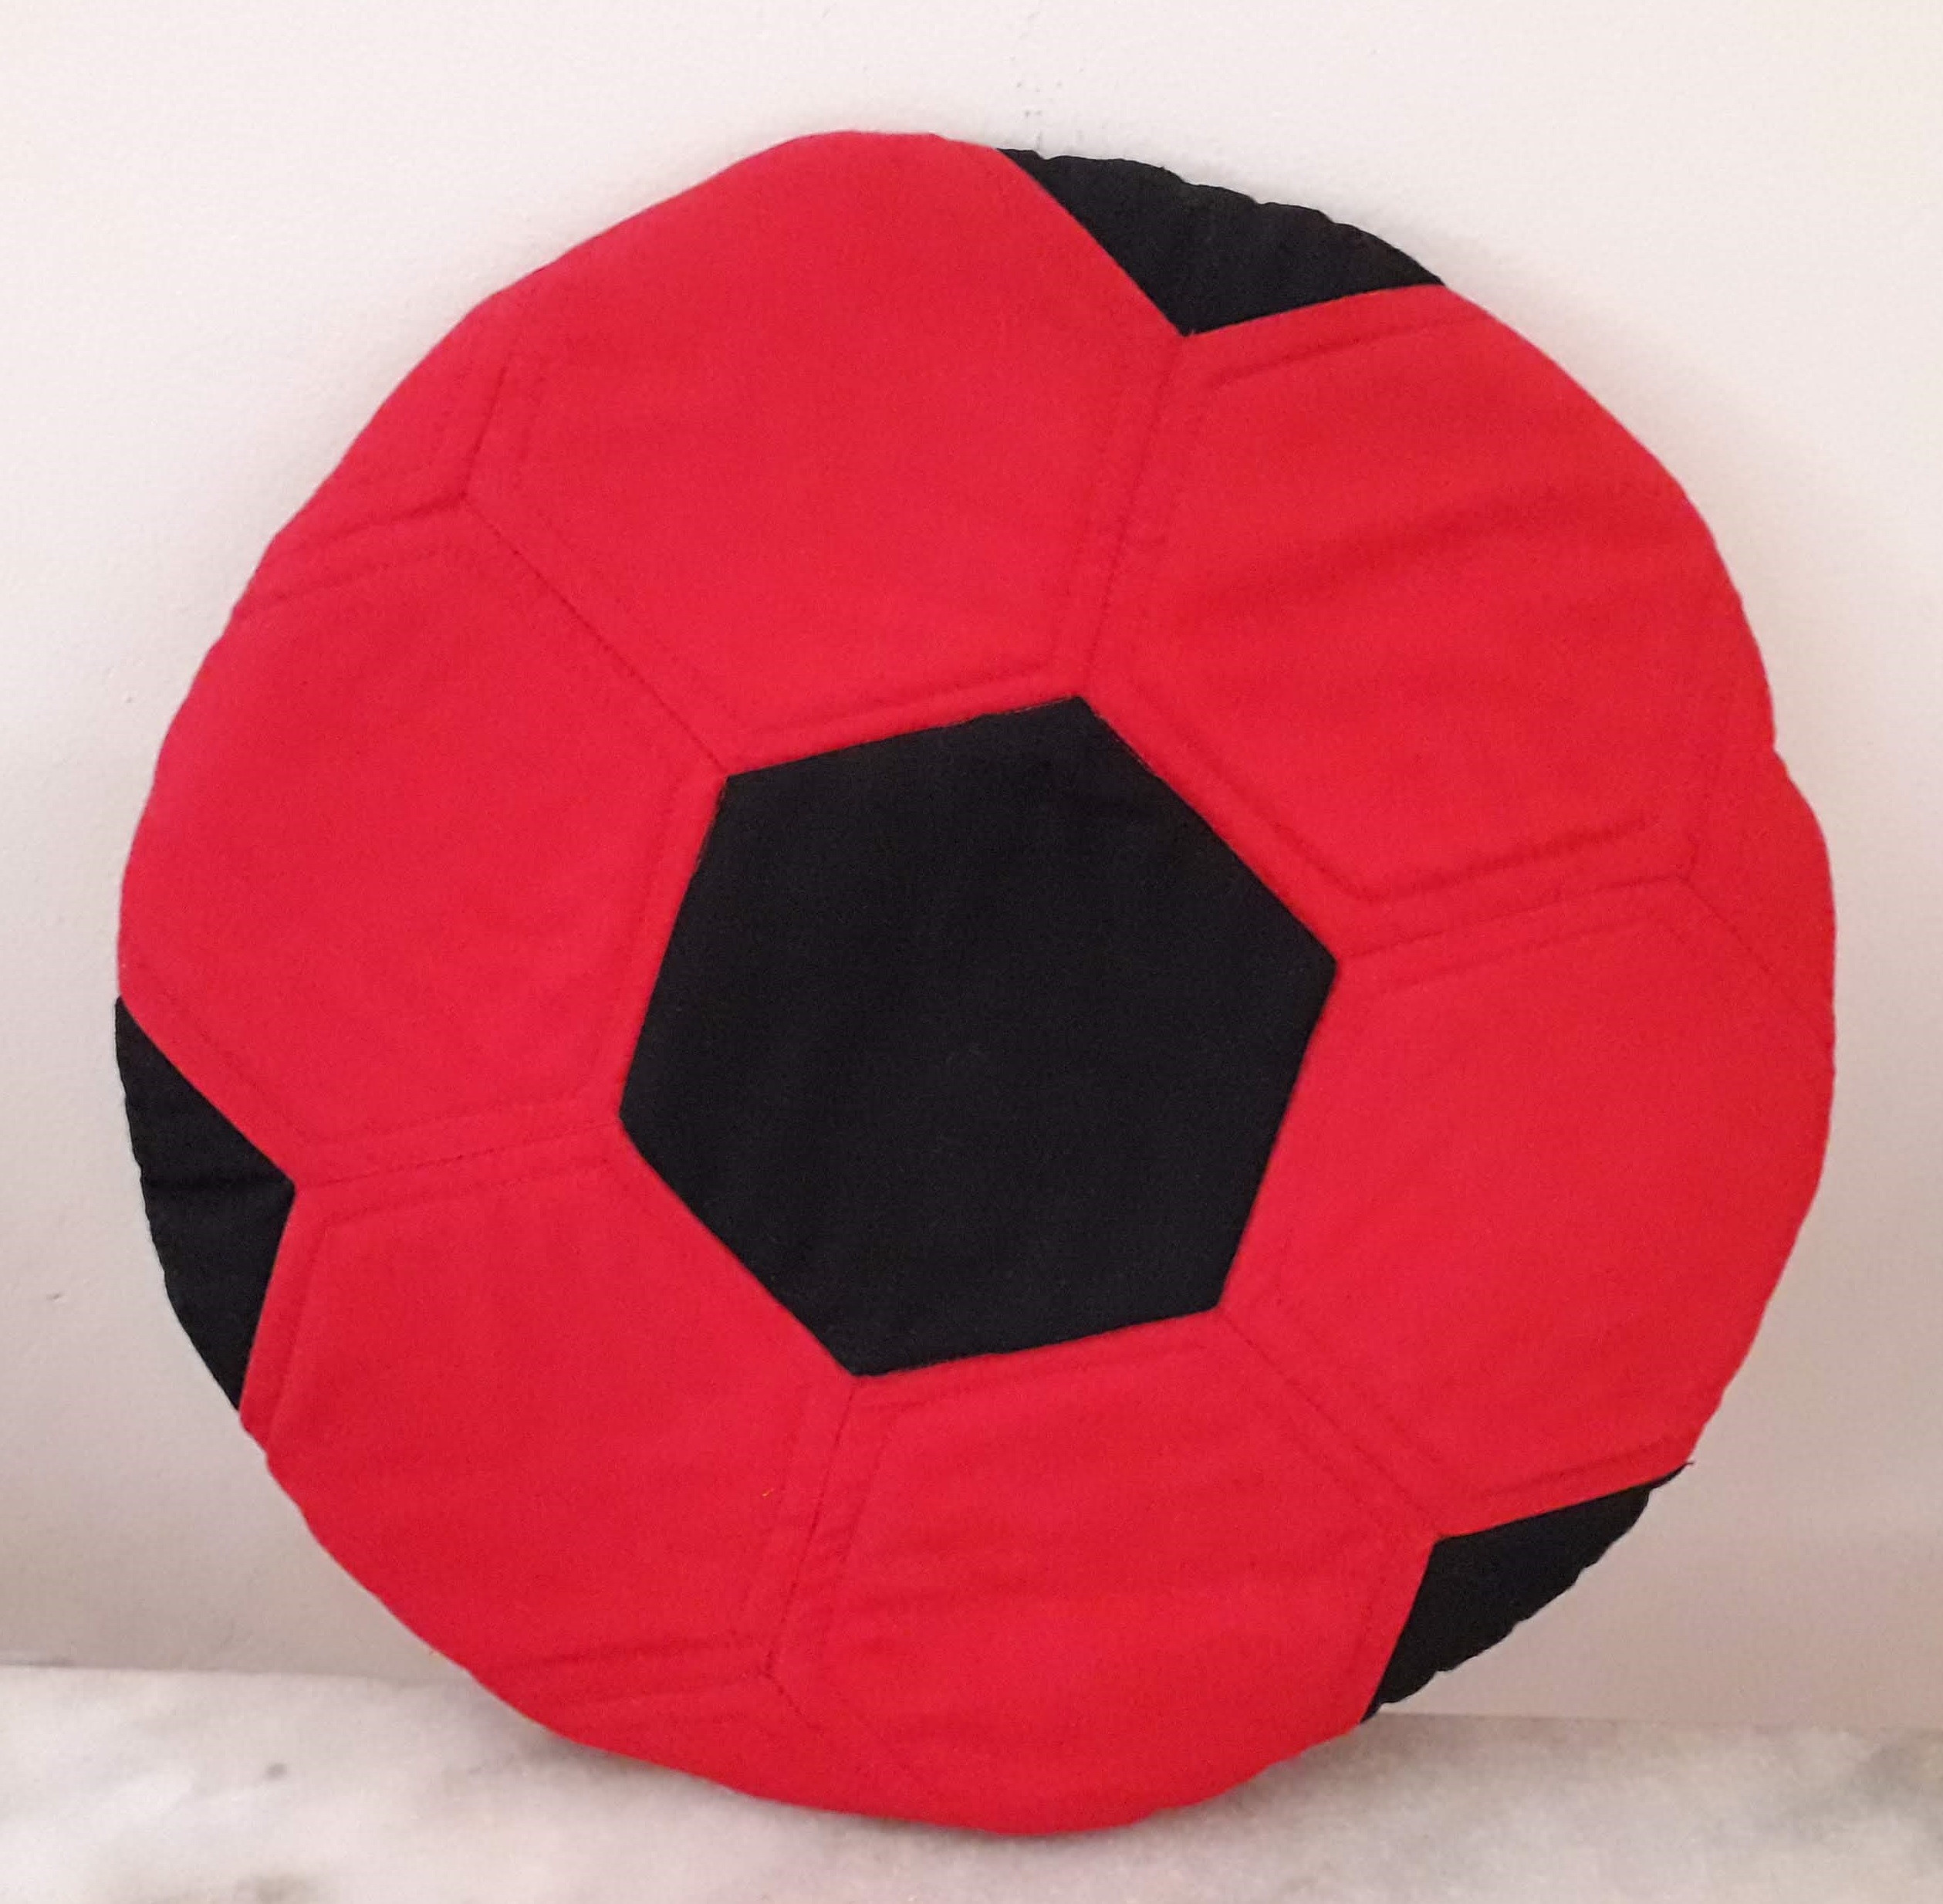 1ba3b792f3 Bola Futebol Flamengo Eva